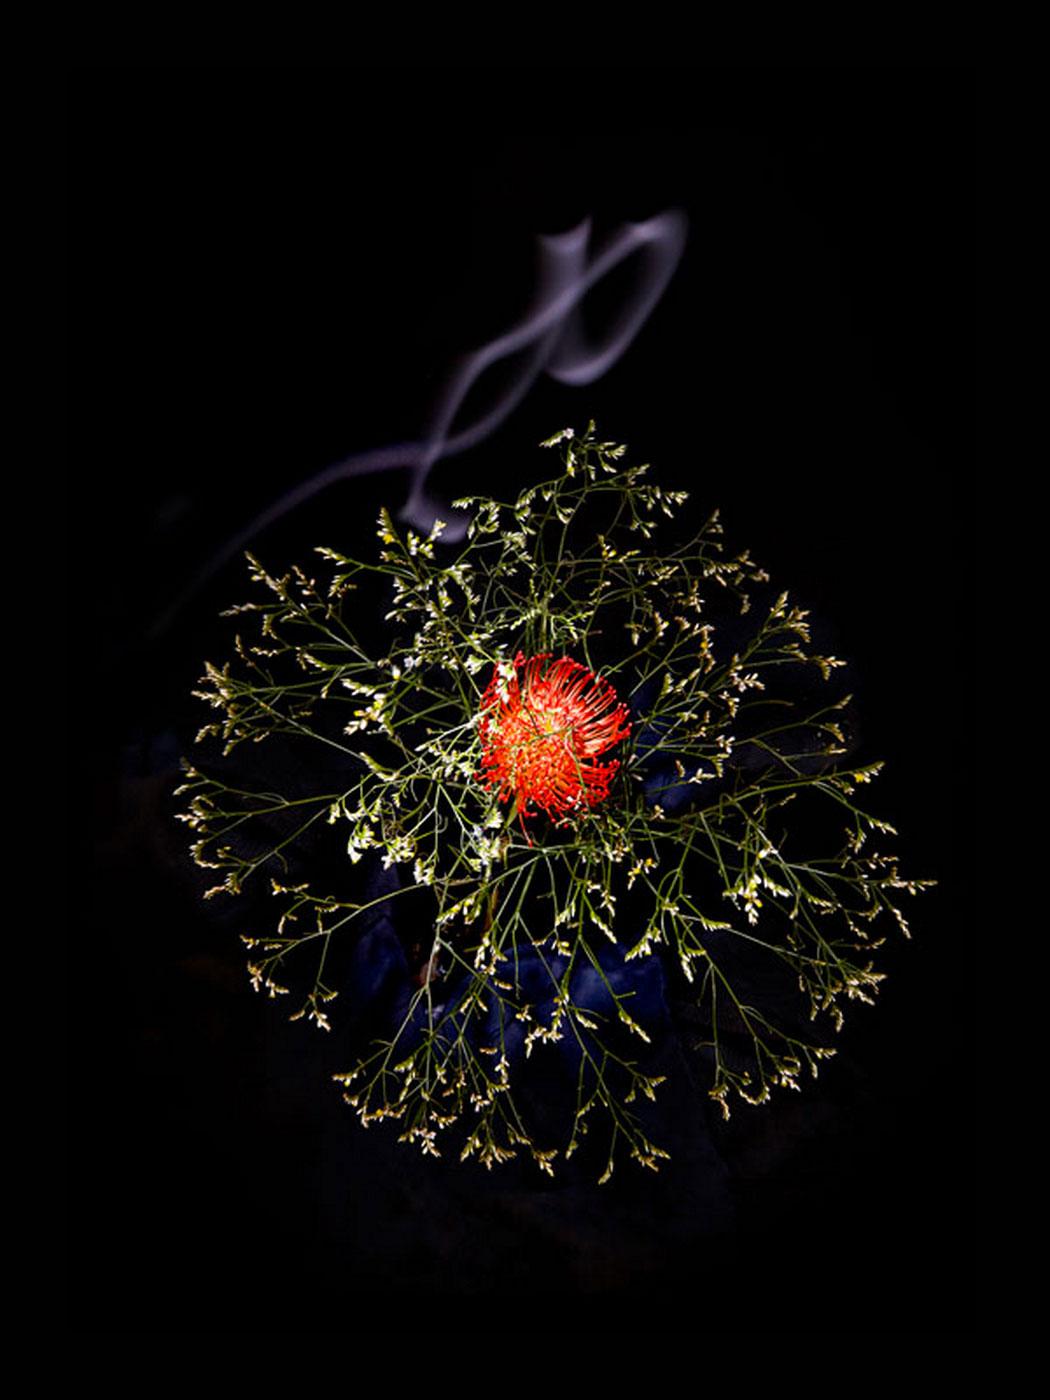 sarah-illenberger-flowerwork-04.jpg